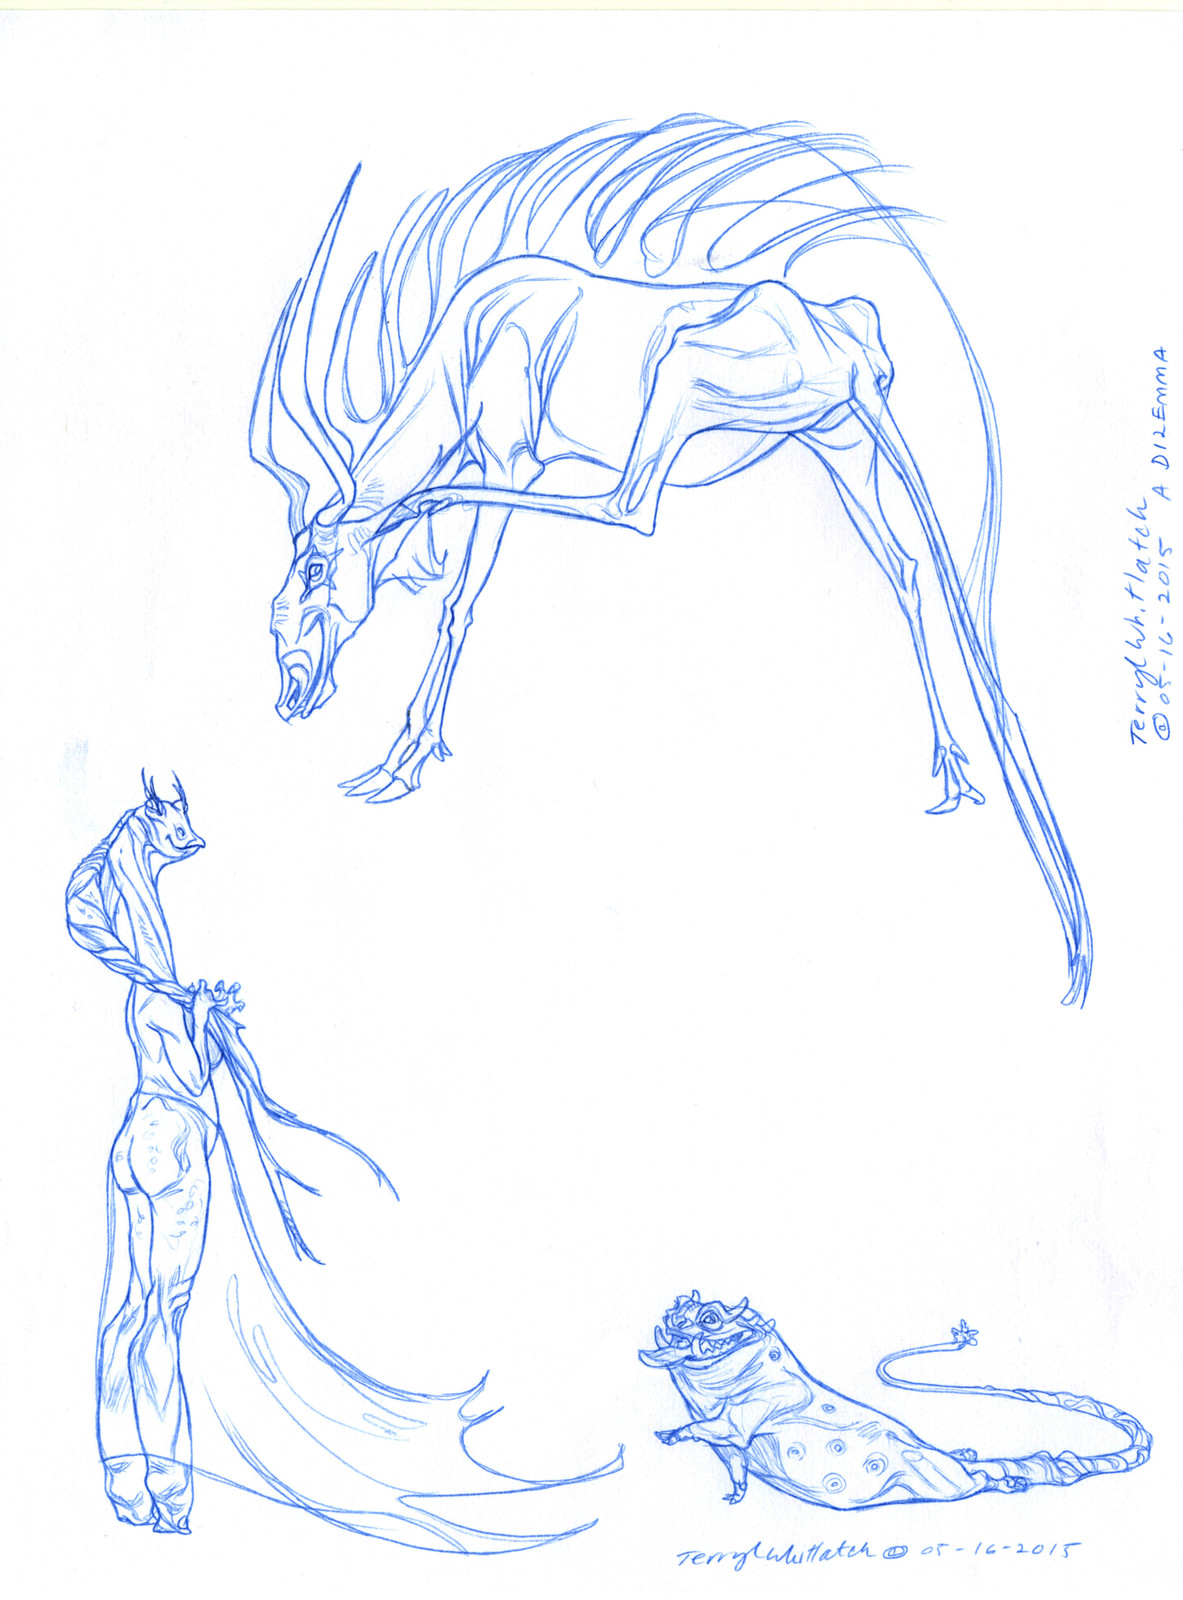 Creature Design 2--Creature into Character, plus Mrs. Binx